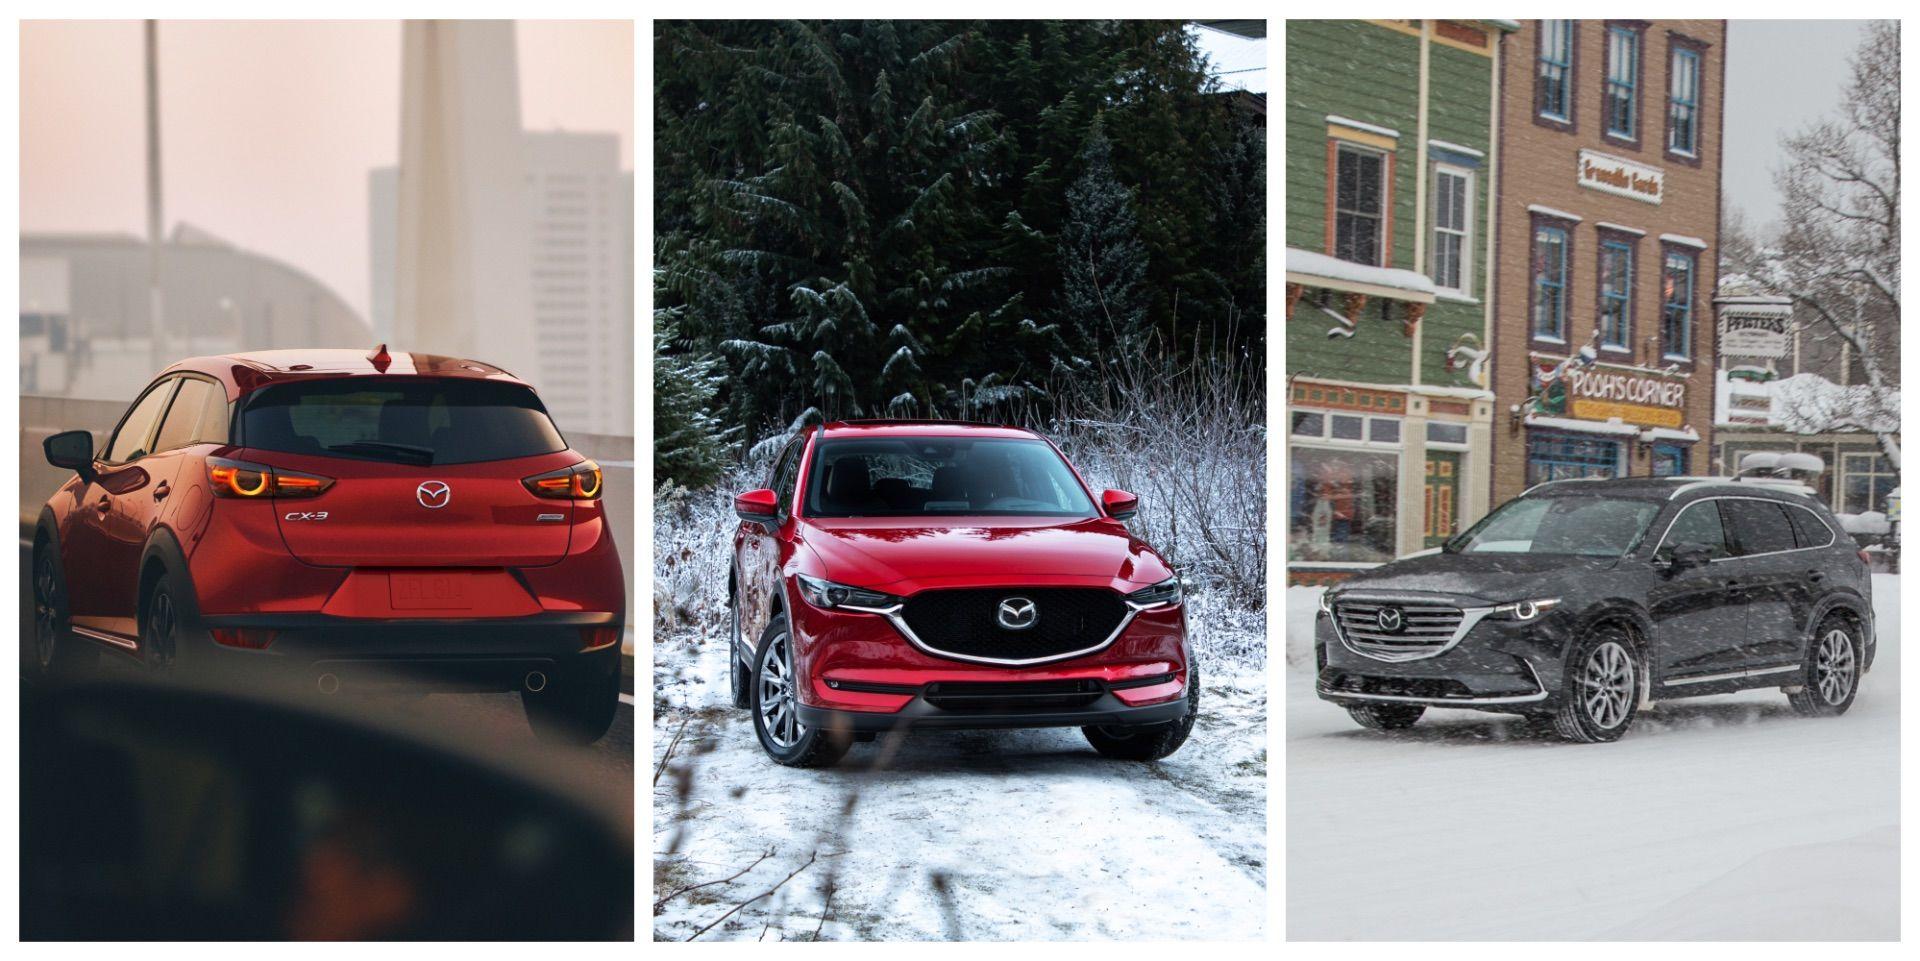 Mazda Canada Set New Sales RecordsWith CX-3, CX-5, And CX-9 In 2018